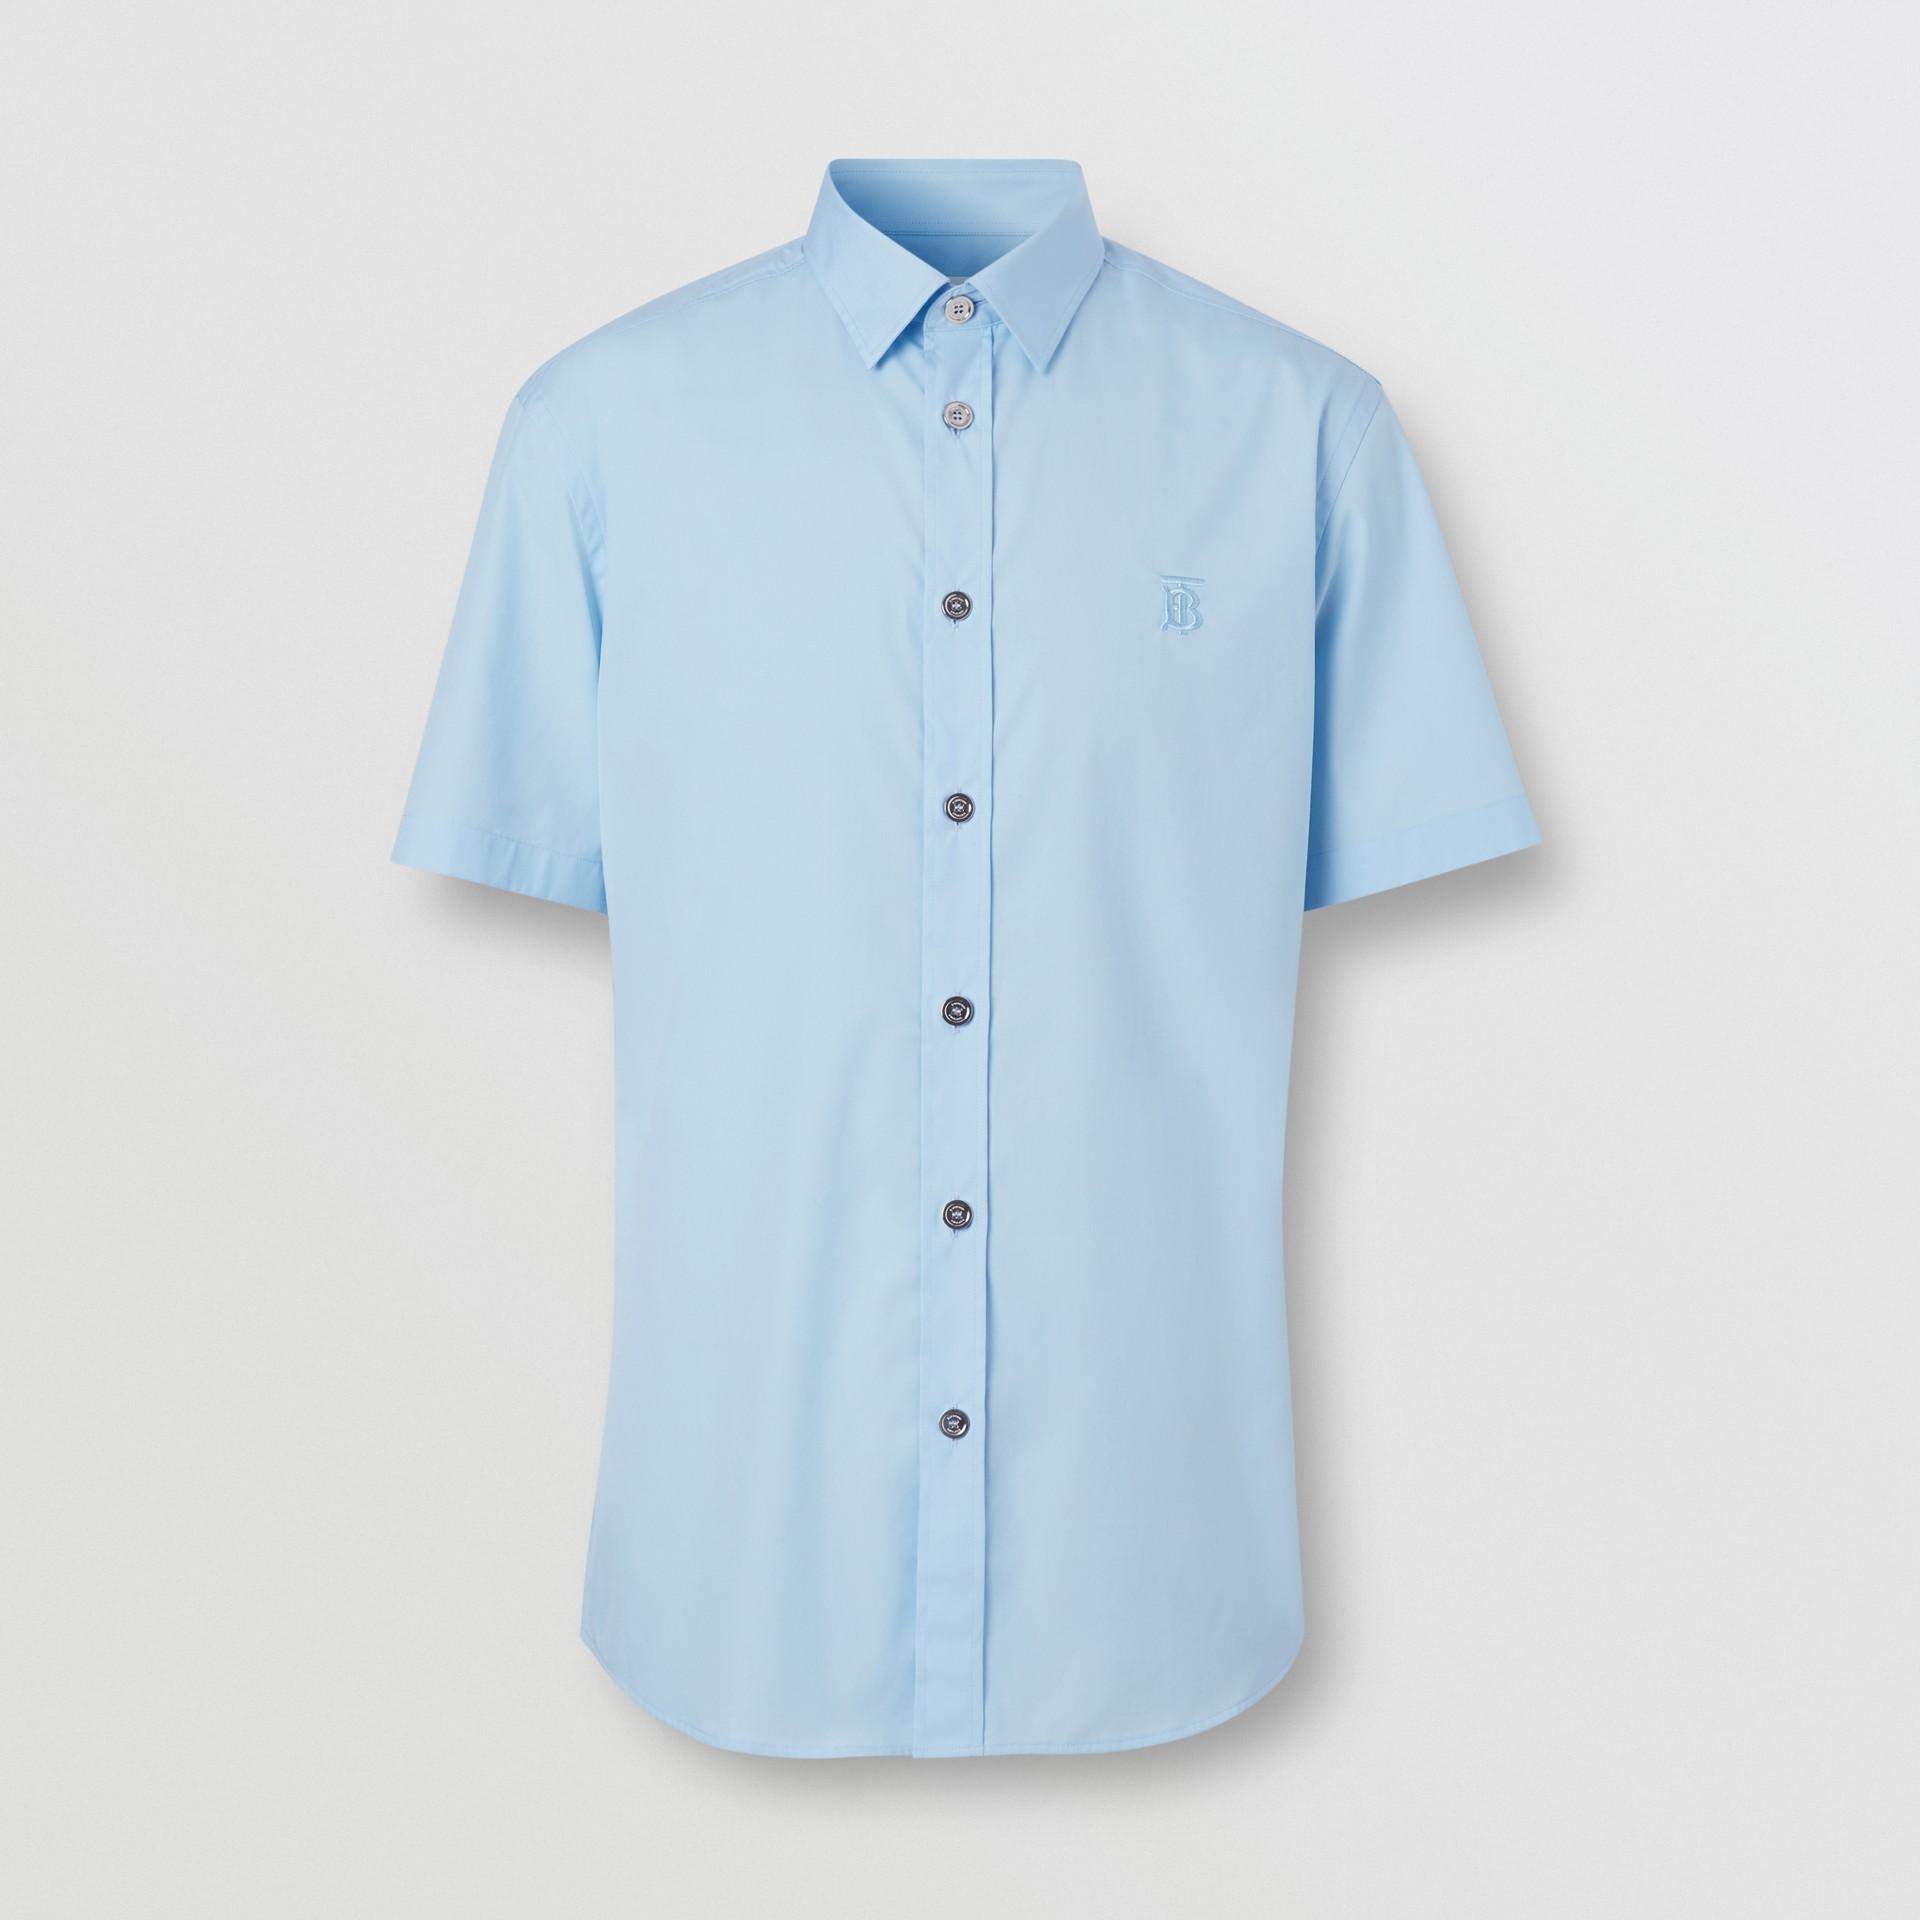 Short-sleeve Monogram Motif Stretch Cotton Shirt in Pale Blue - Men | Burberry United Kingdom - gallery image 3